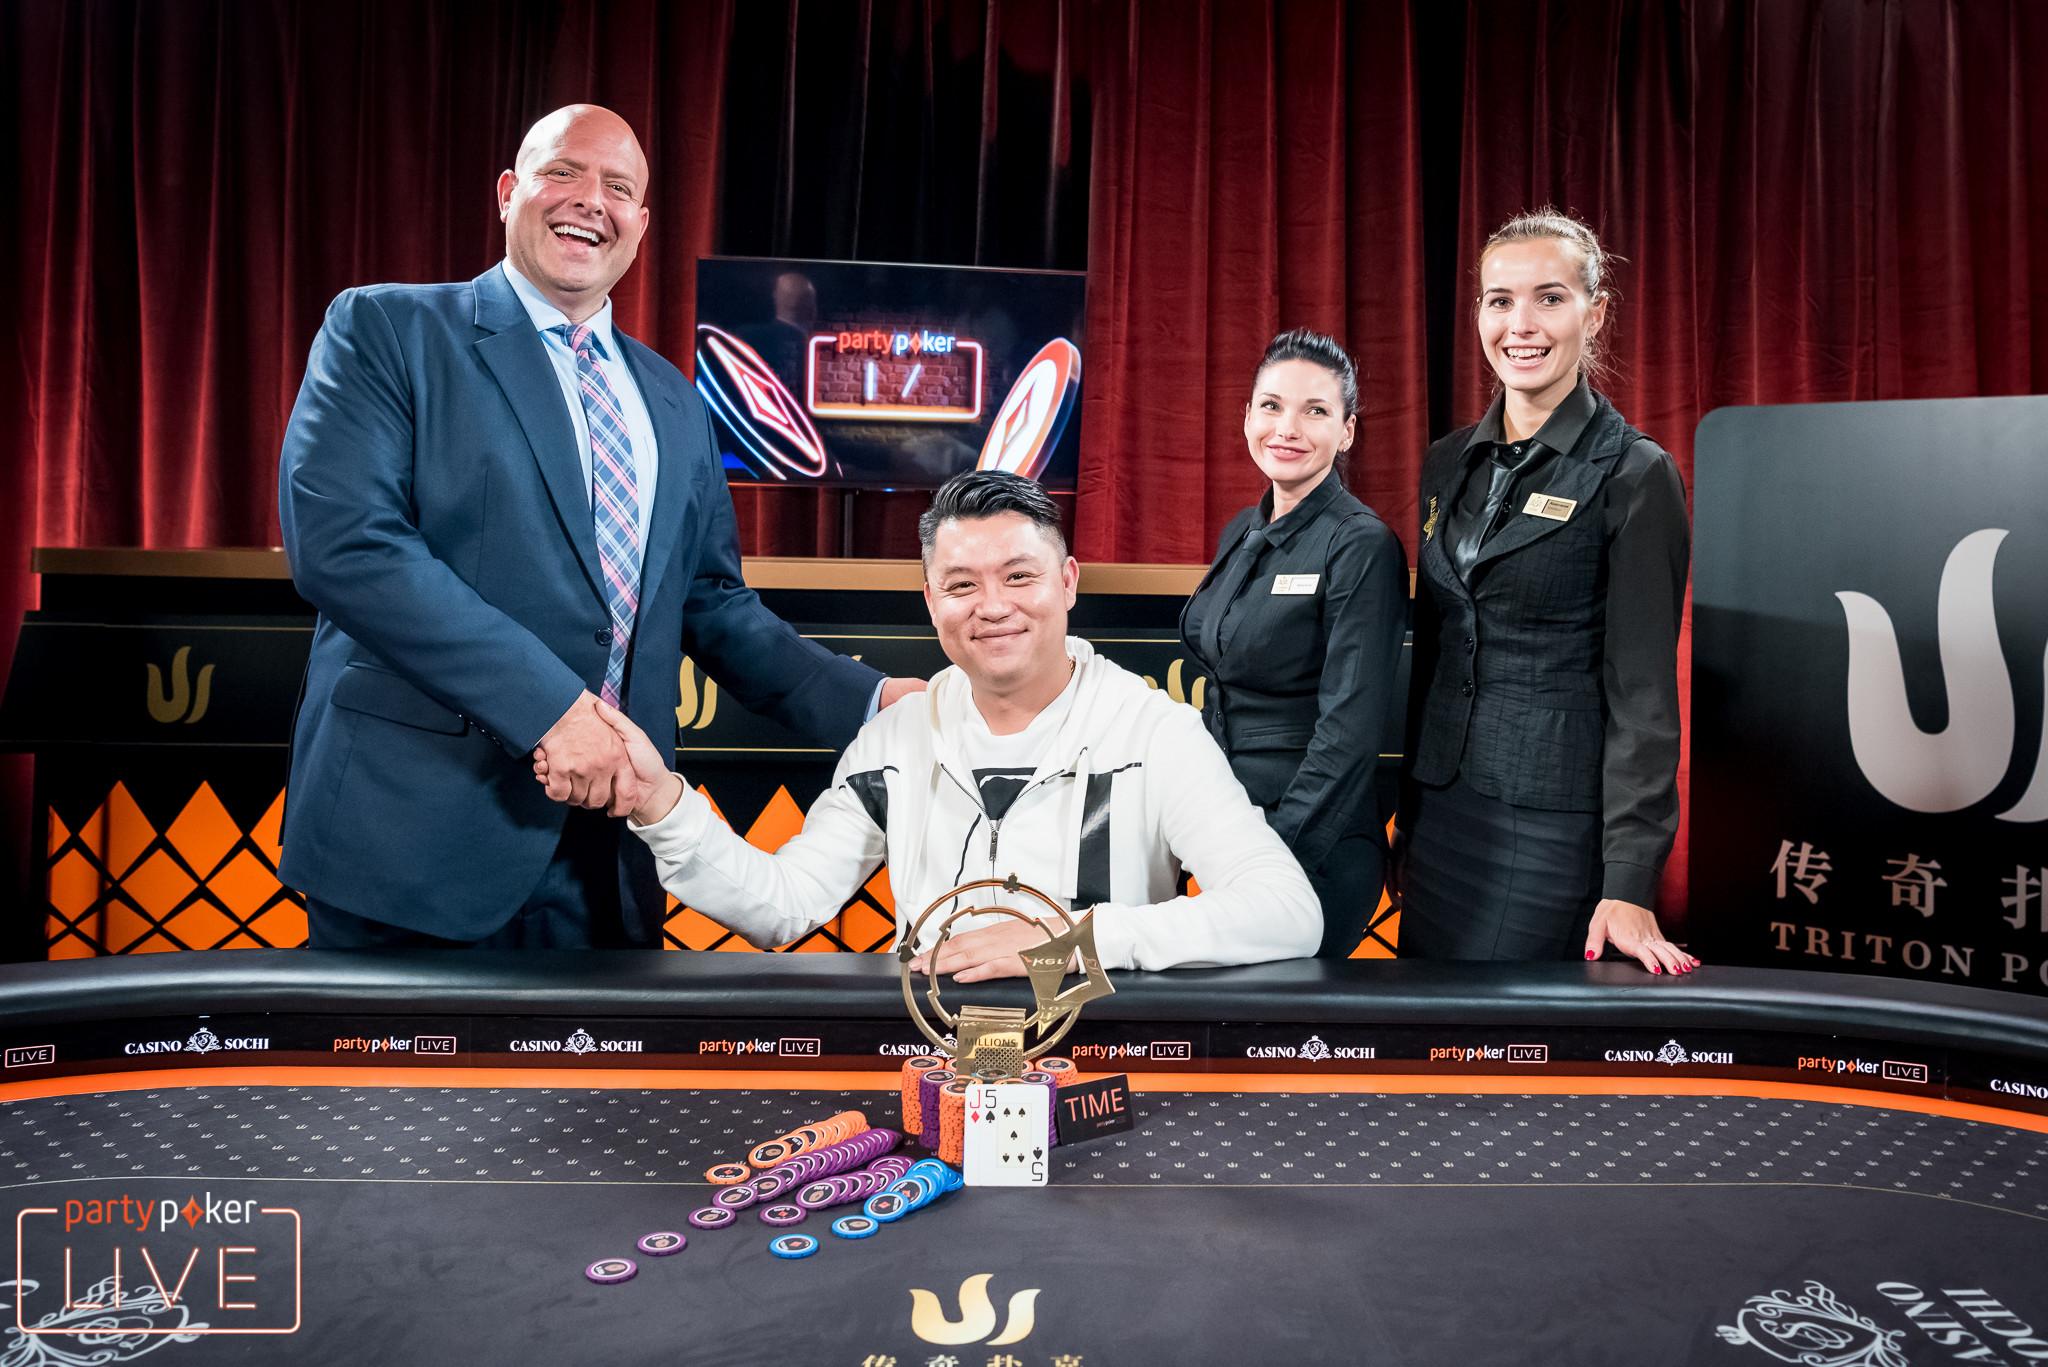 Ivan Leow Wins the Triton Poker Super High Roller in Sochi